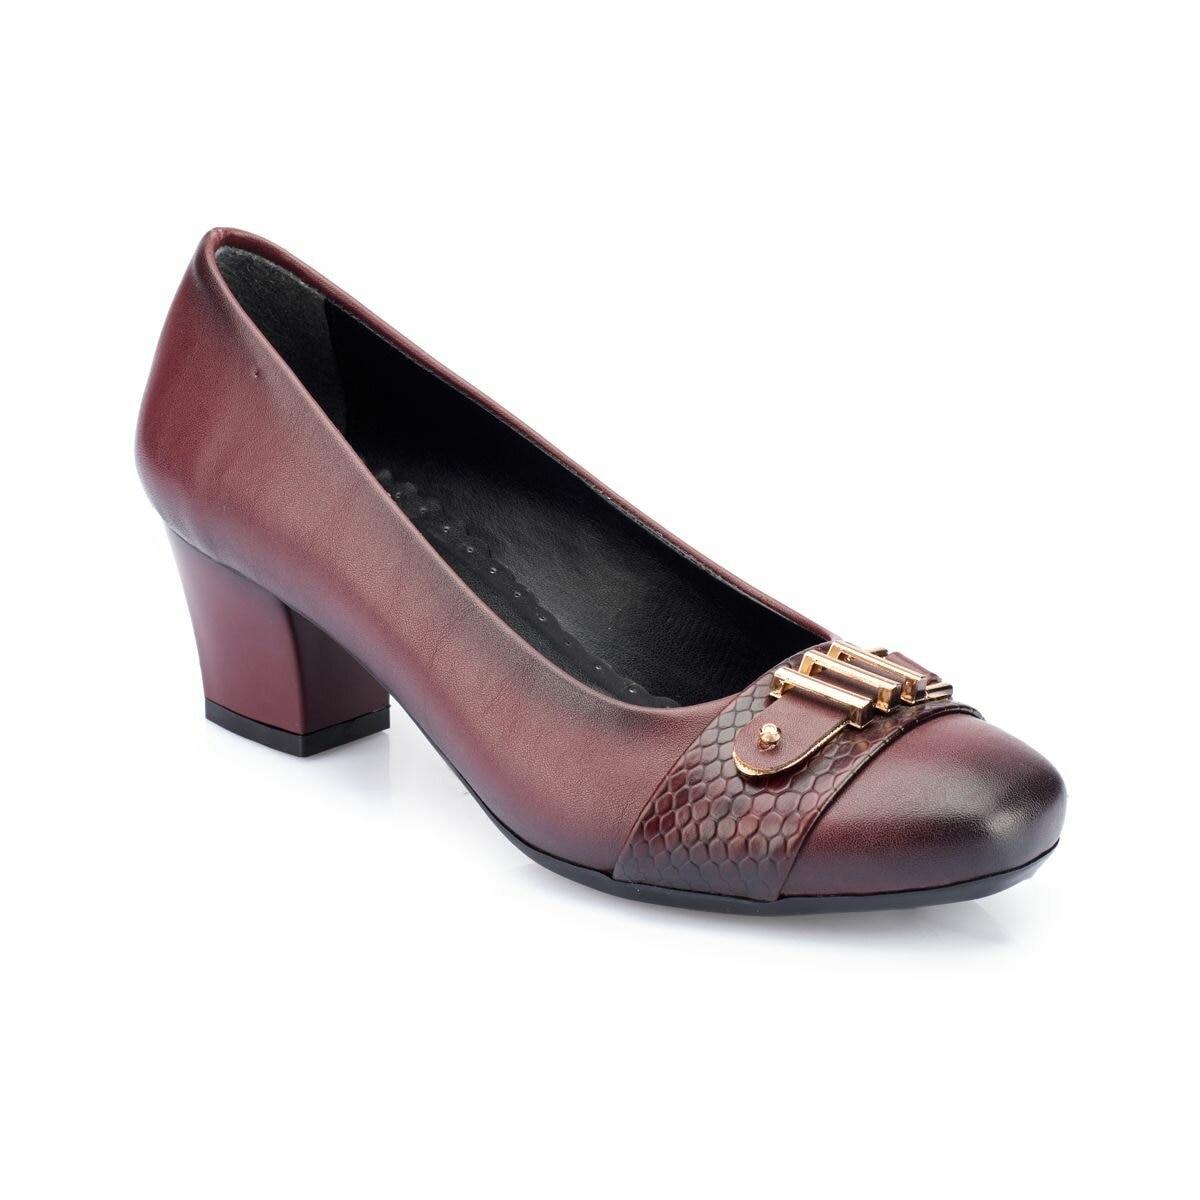 FLO 82.310264.Z Burgundy Women 'S Shoes Polaris